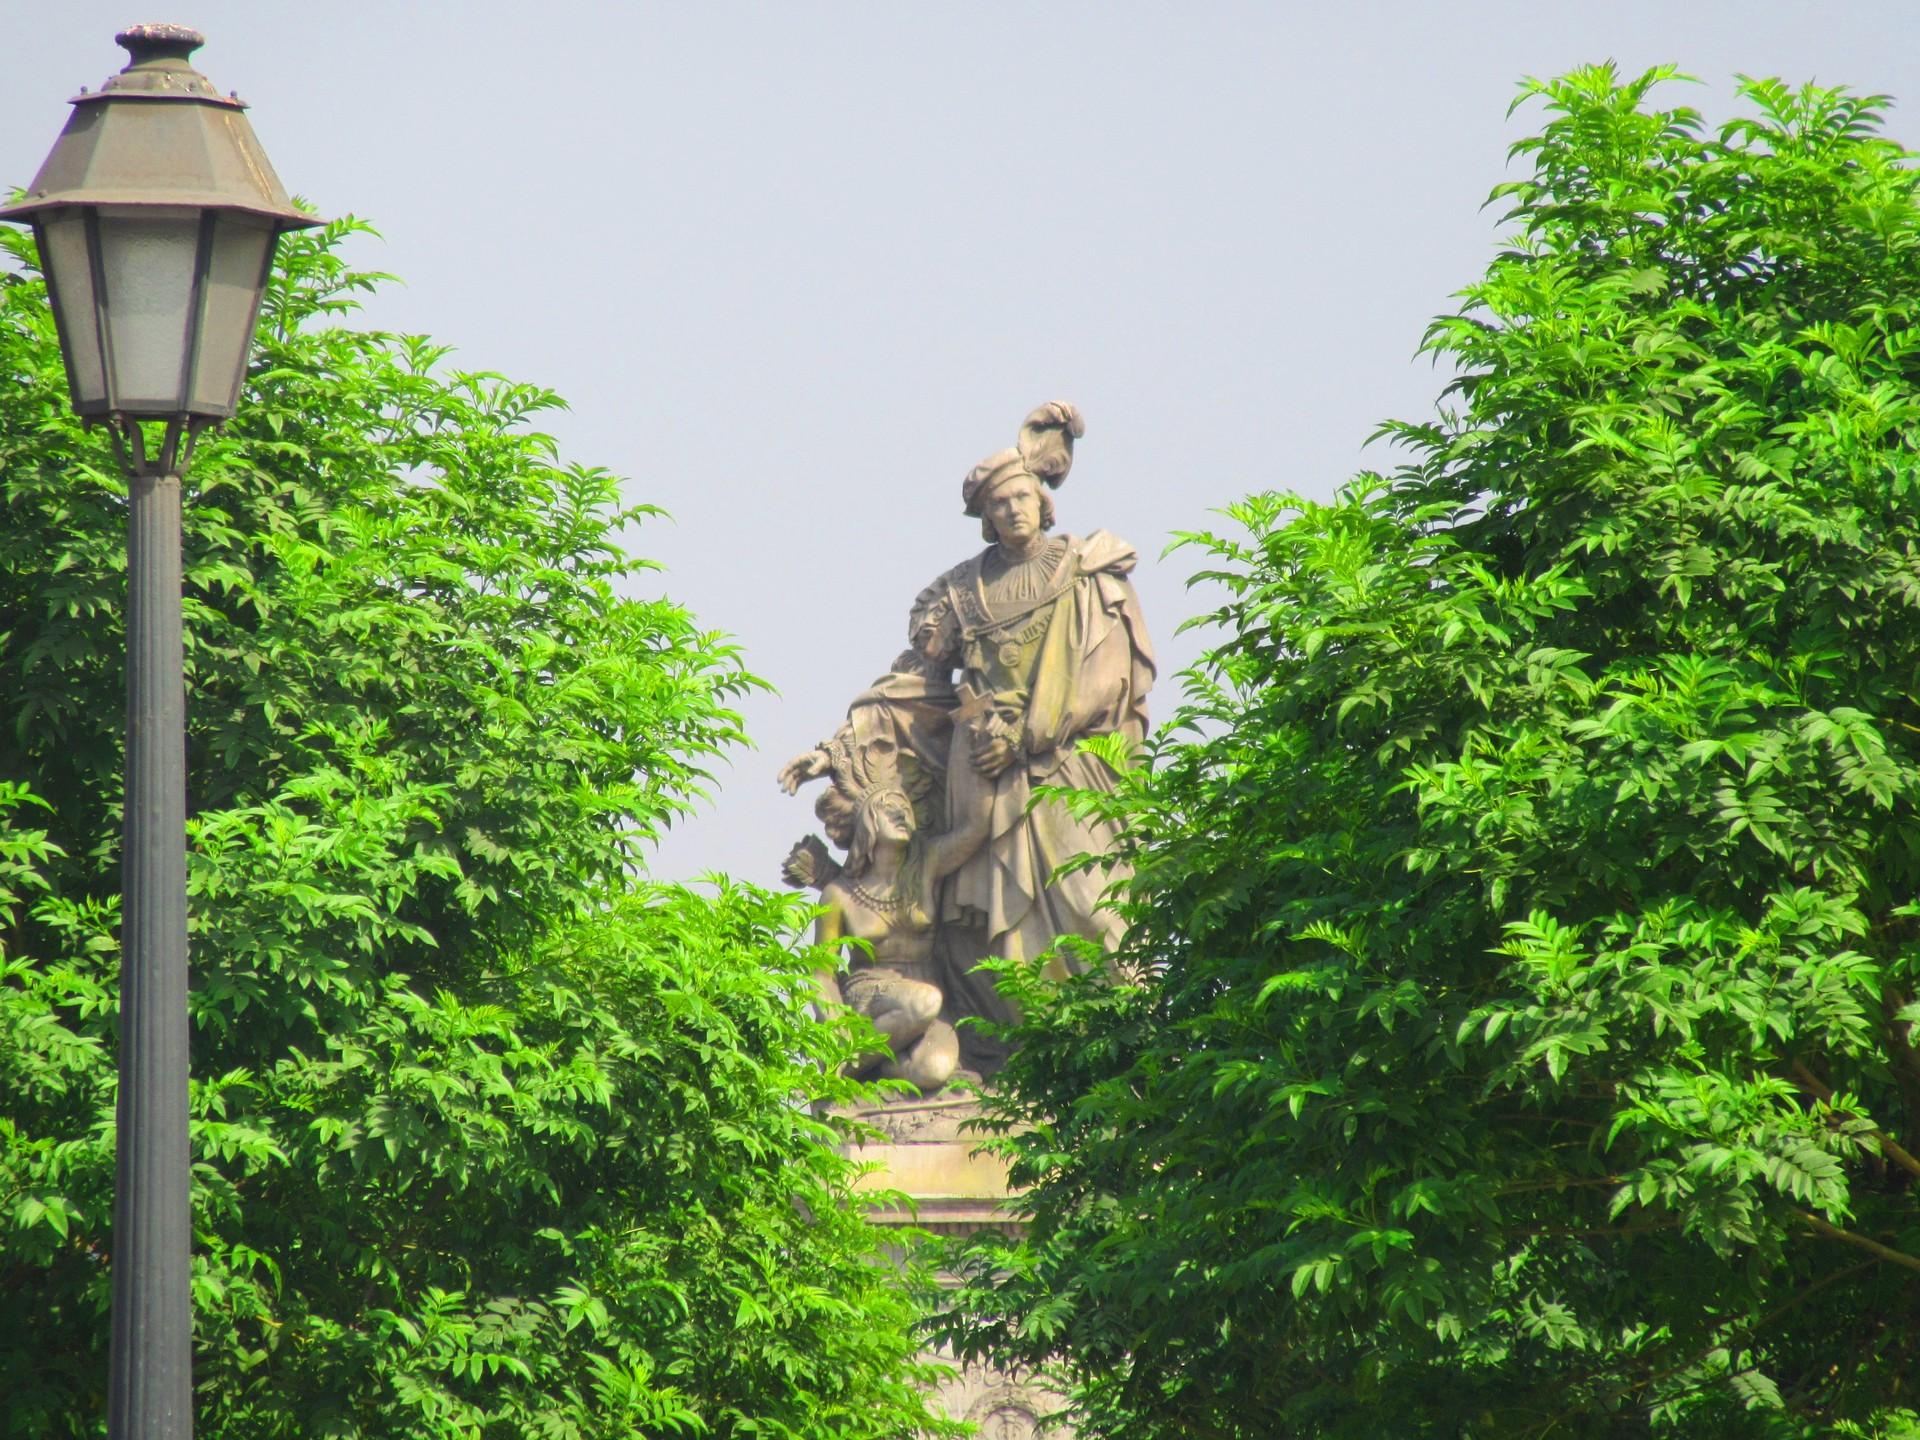 monumentos-lujo-medio-bullicio-limeno-0e